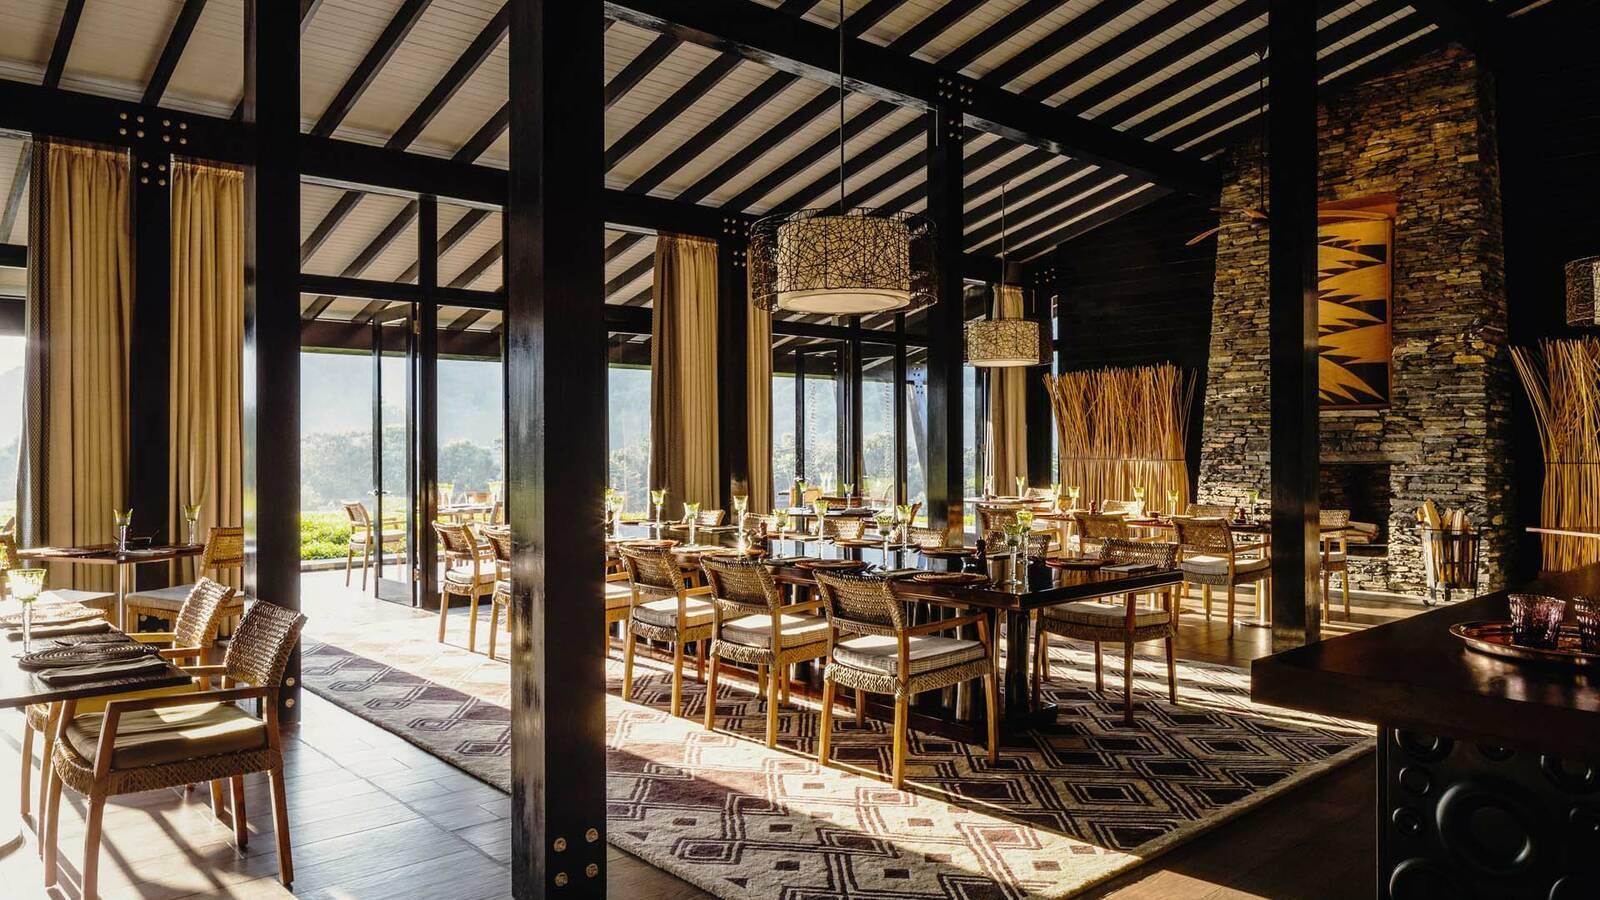 Rwanda OneandOnly NyungweHouse_Dining Room